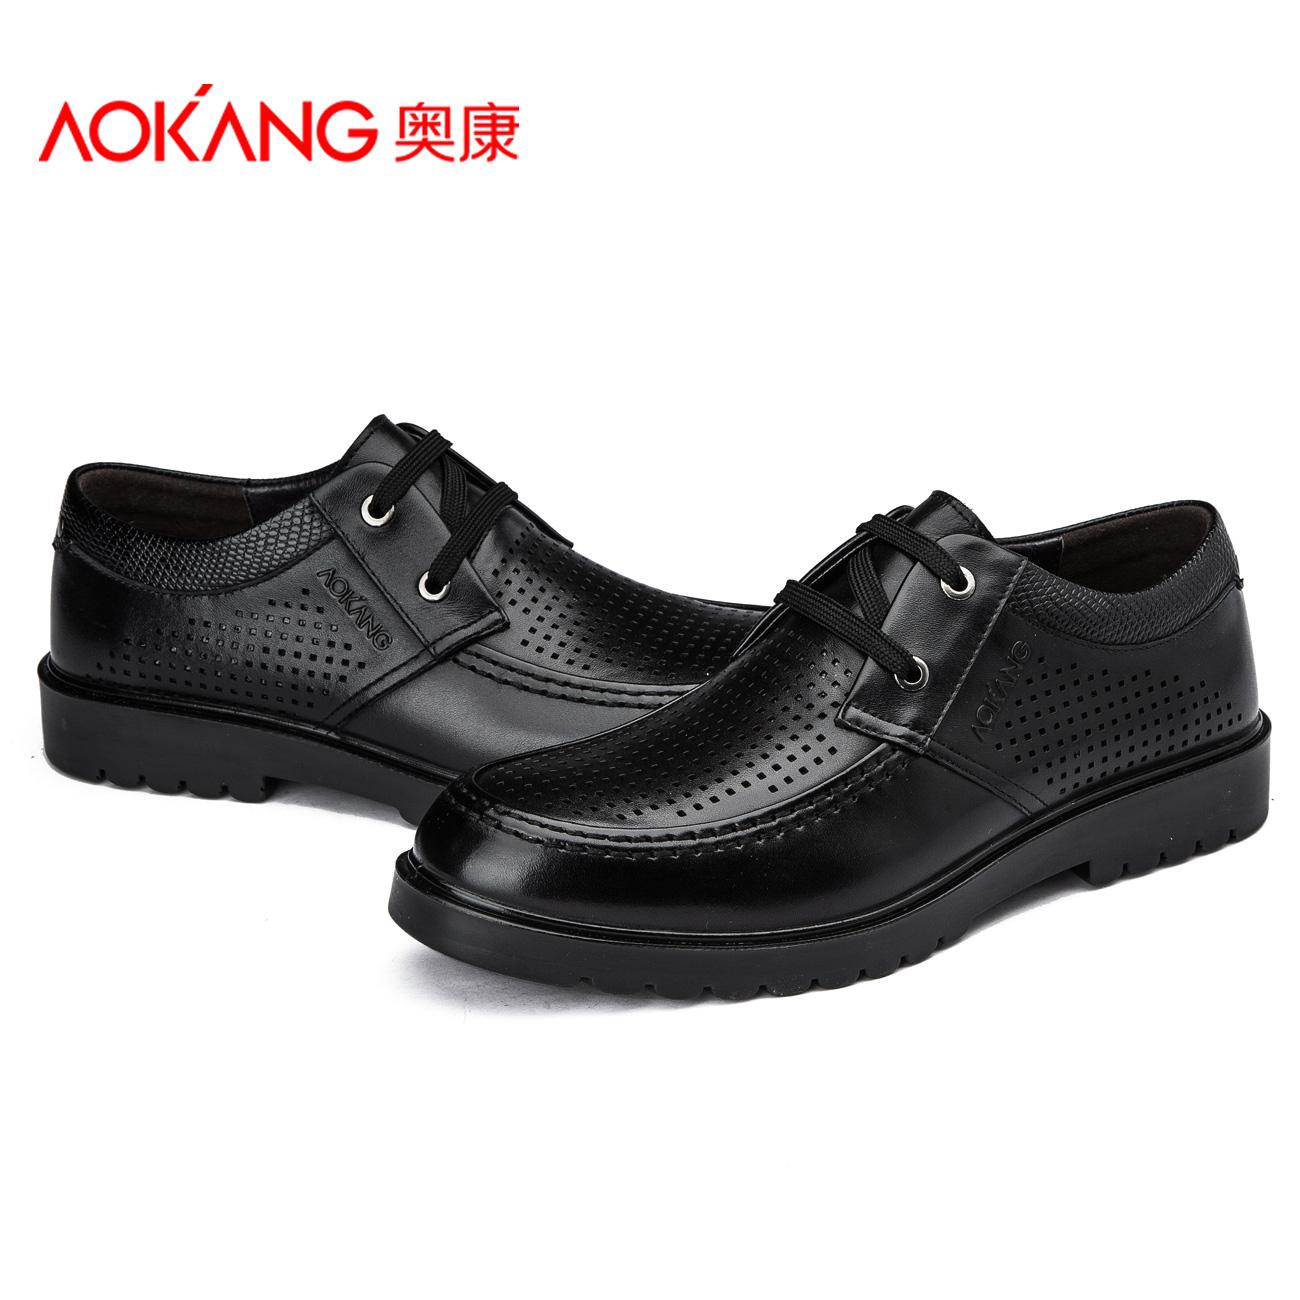 Демисезонные ботинки Aokang 153512026